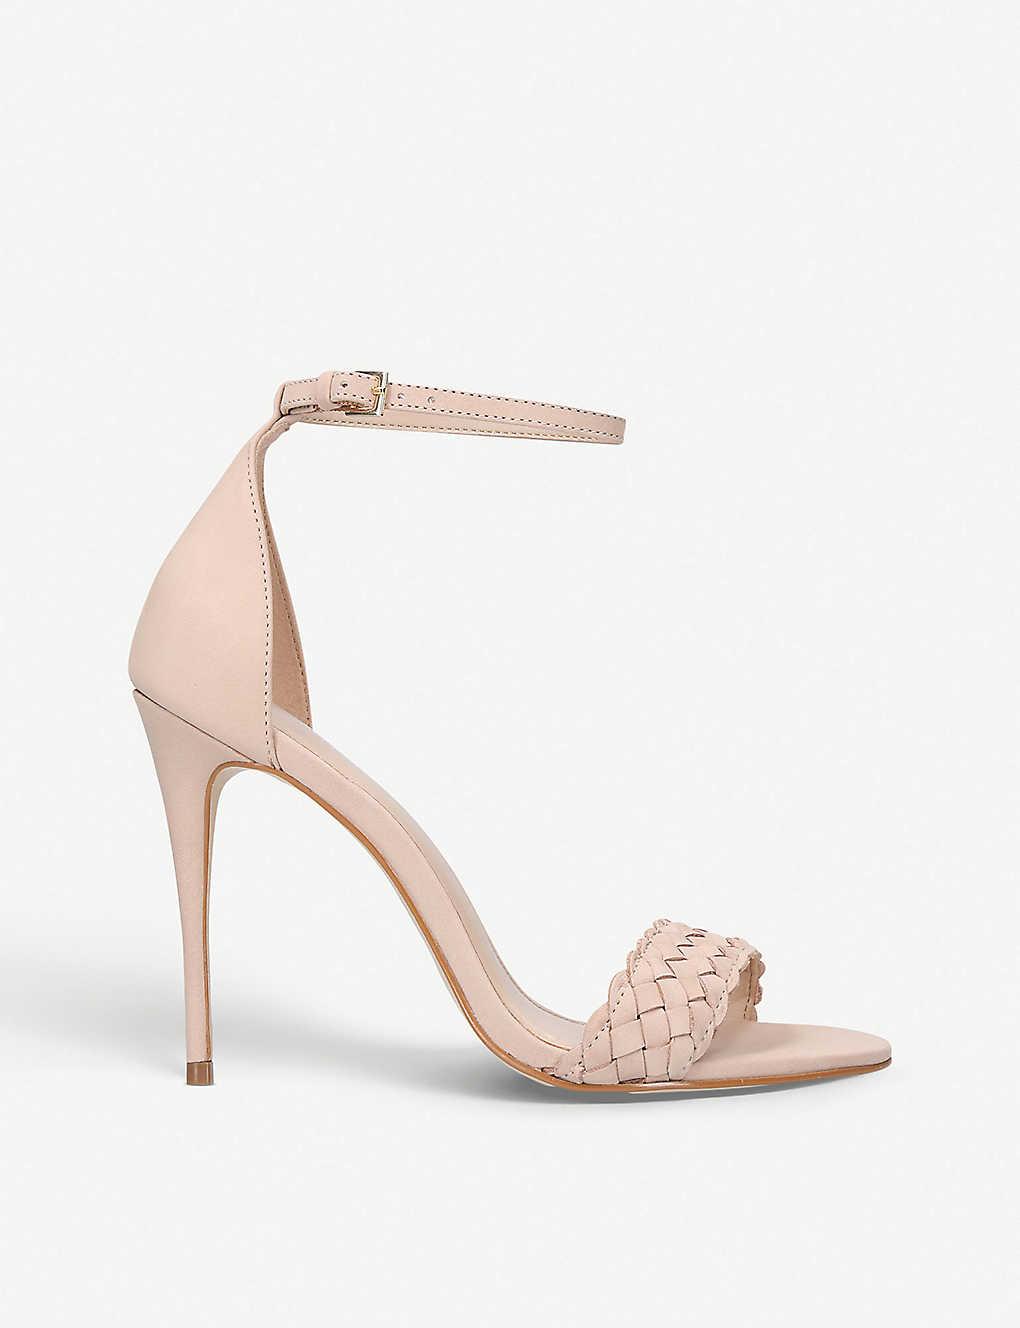 231c376a68 CARVELA - Glimpse braided leather heeled sandals | Selfridges.com